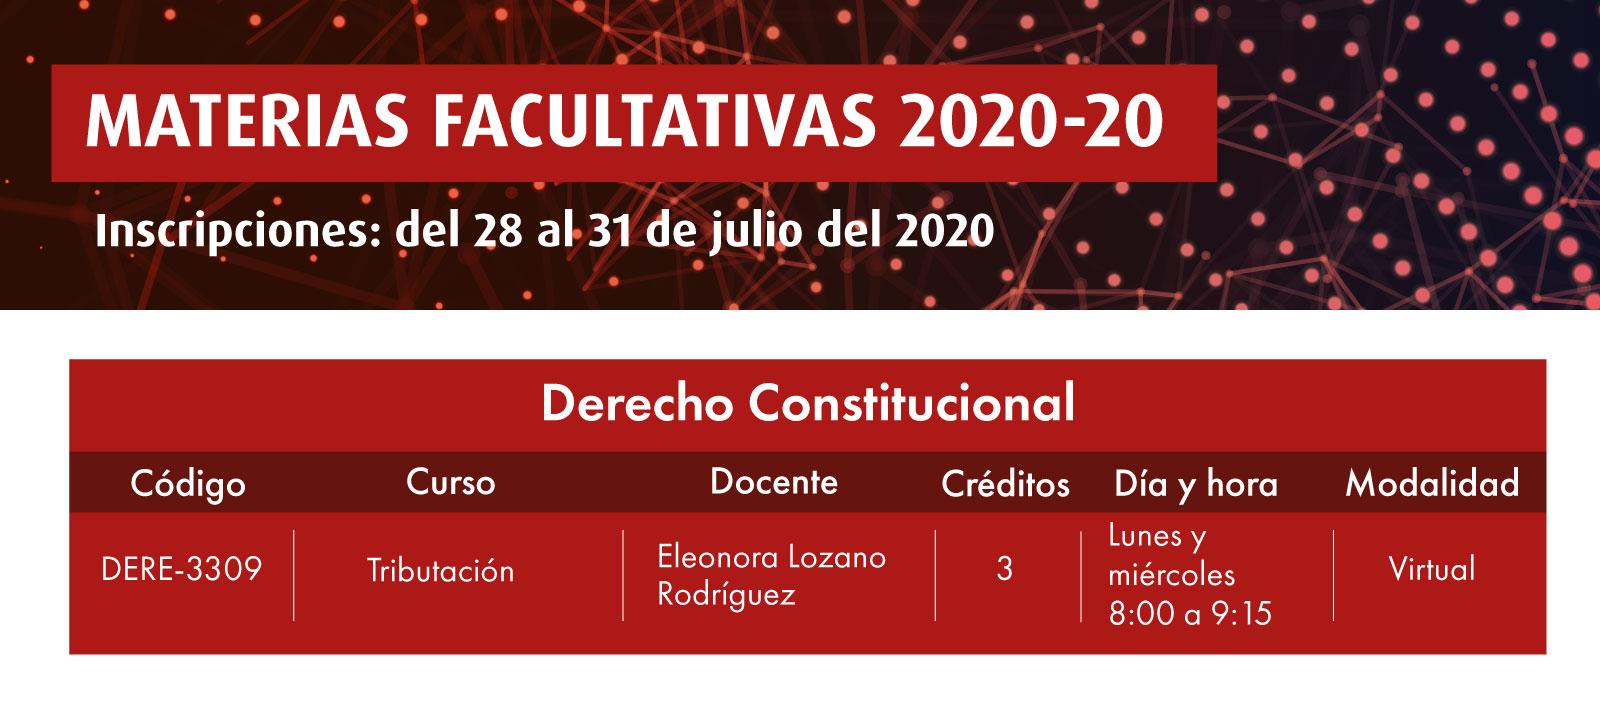 Facultativa 2020-20: Tributación